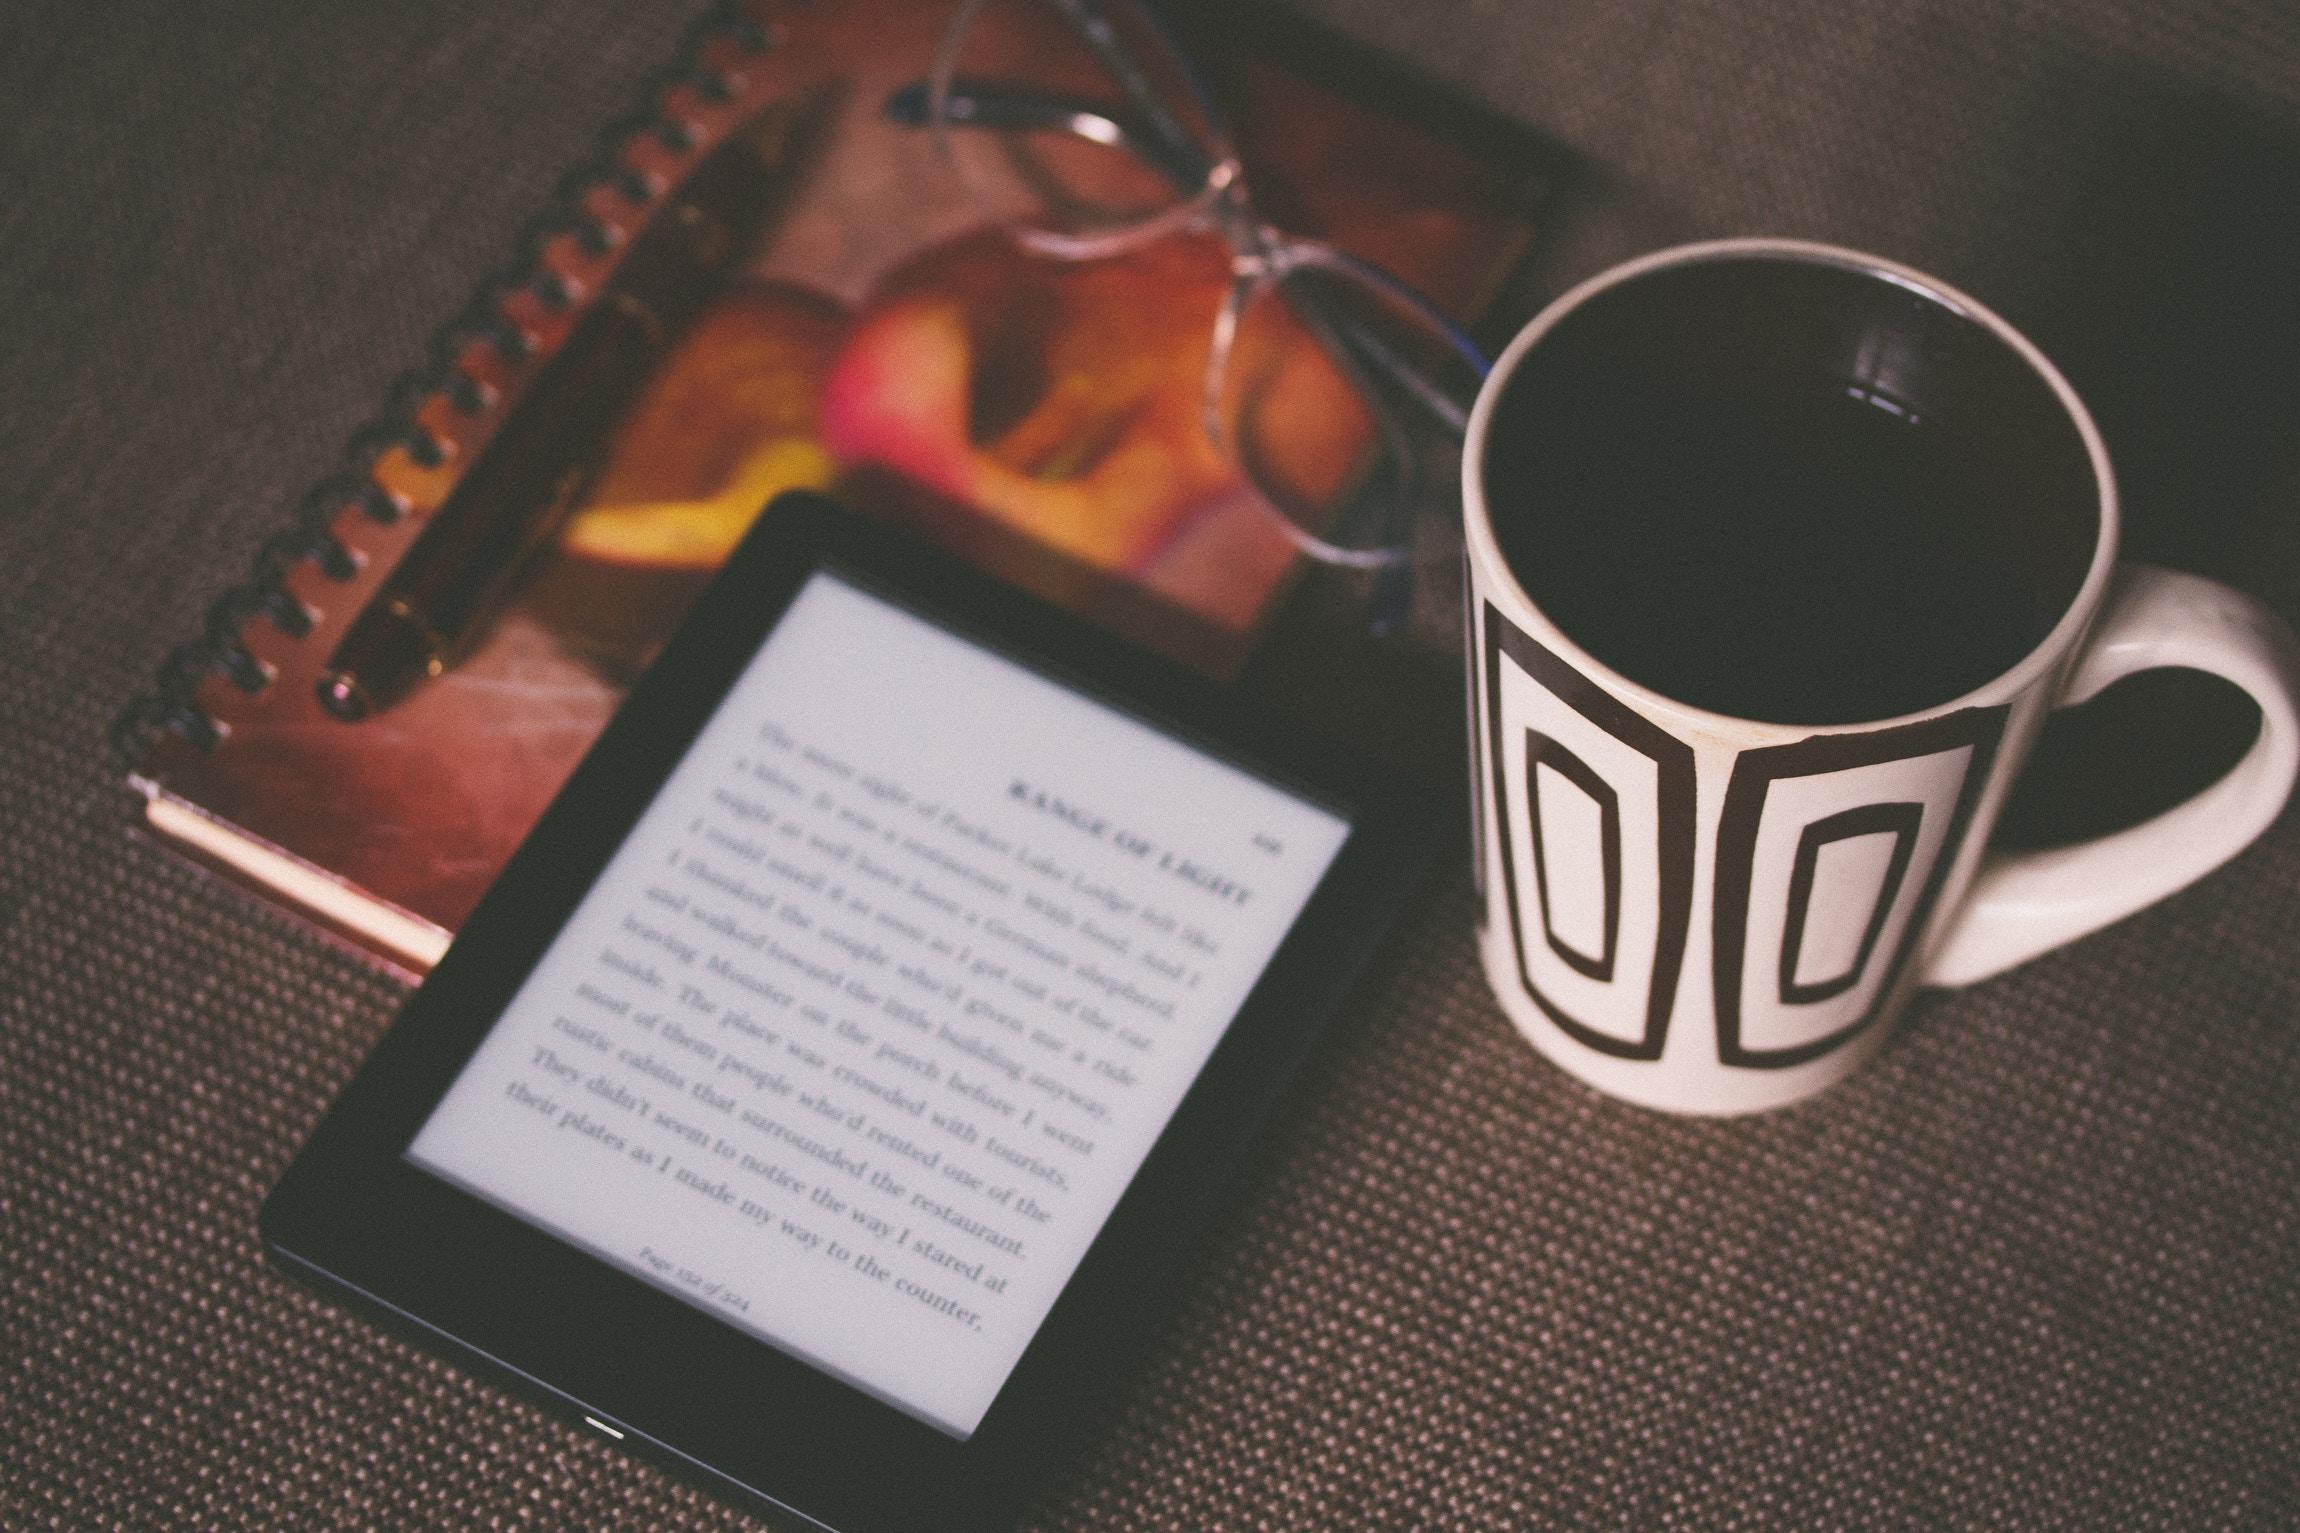 Reading an ebook